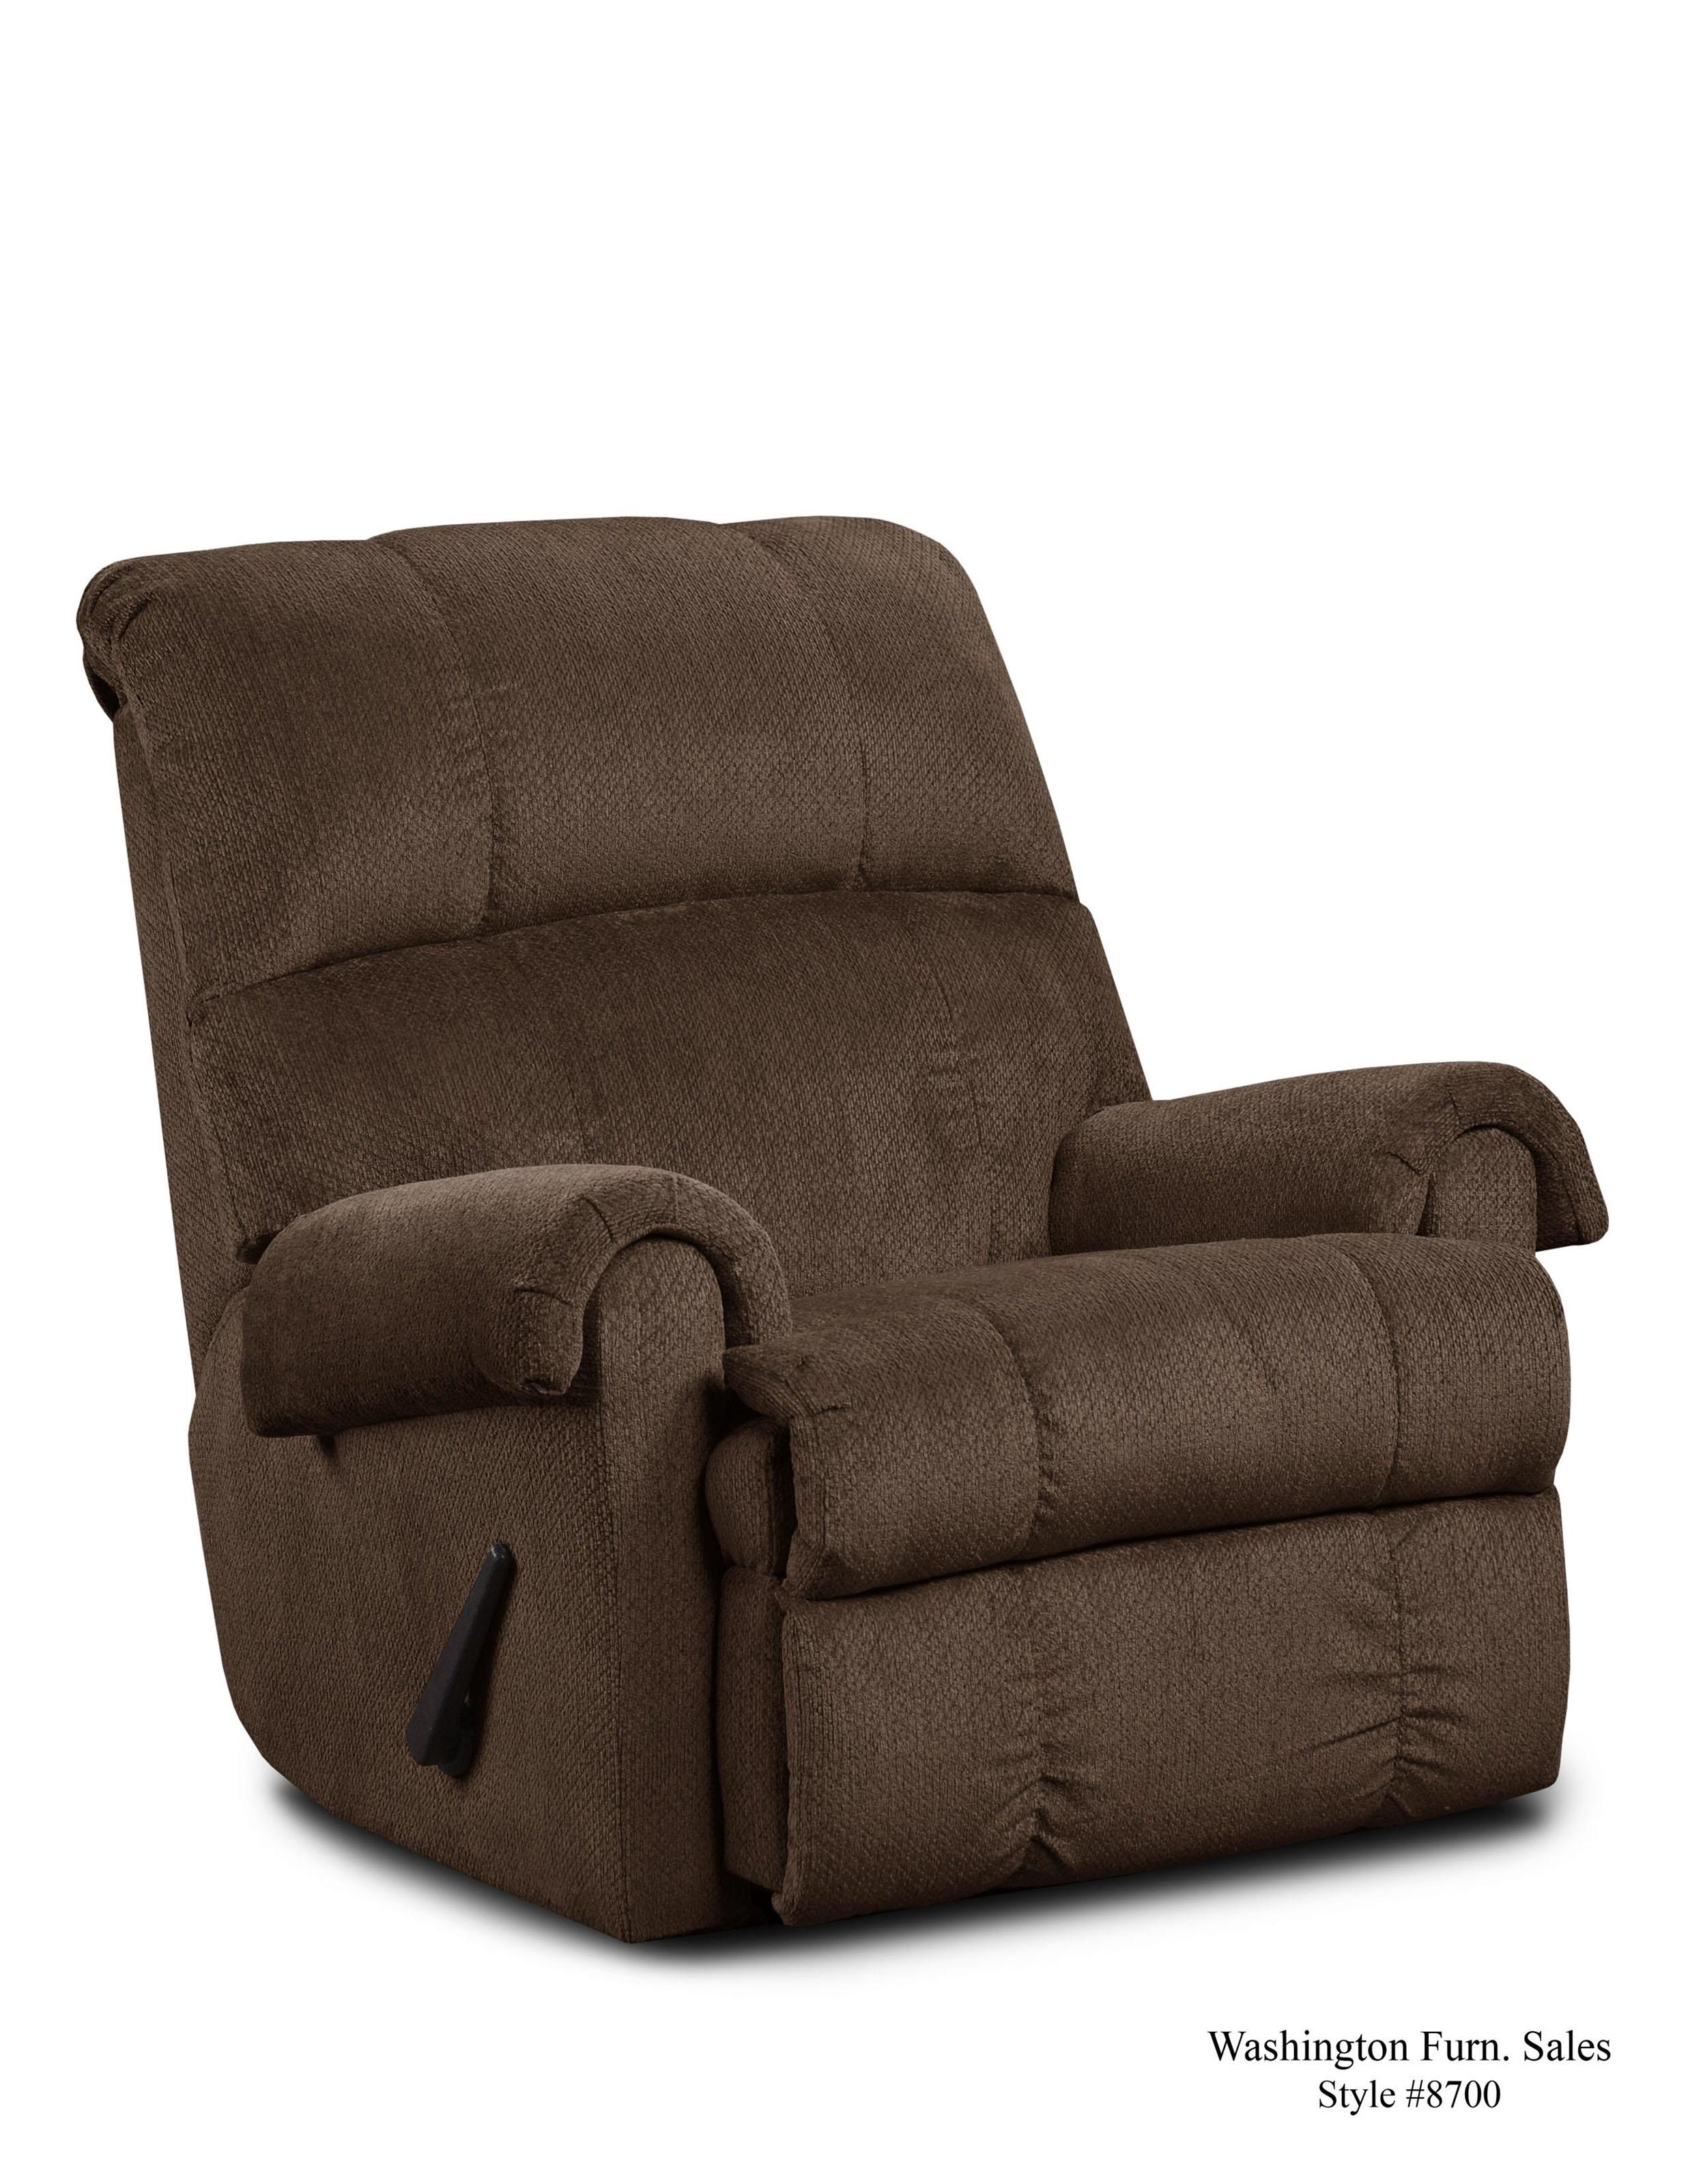 Washington Furniture 8700 KELLY Brown Recliner - Item Number: 8700 Kelly Brown